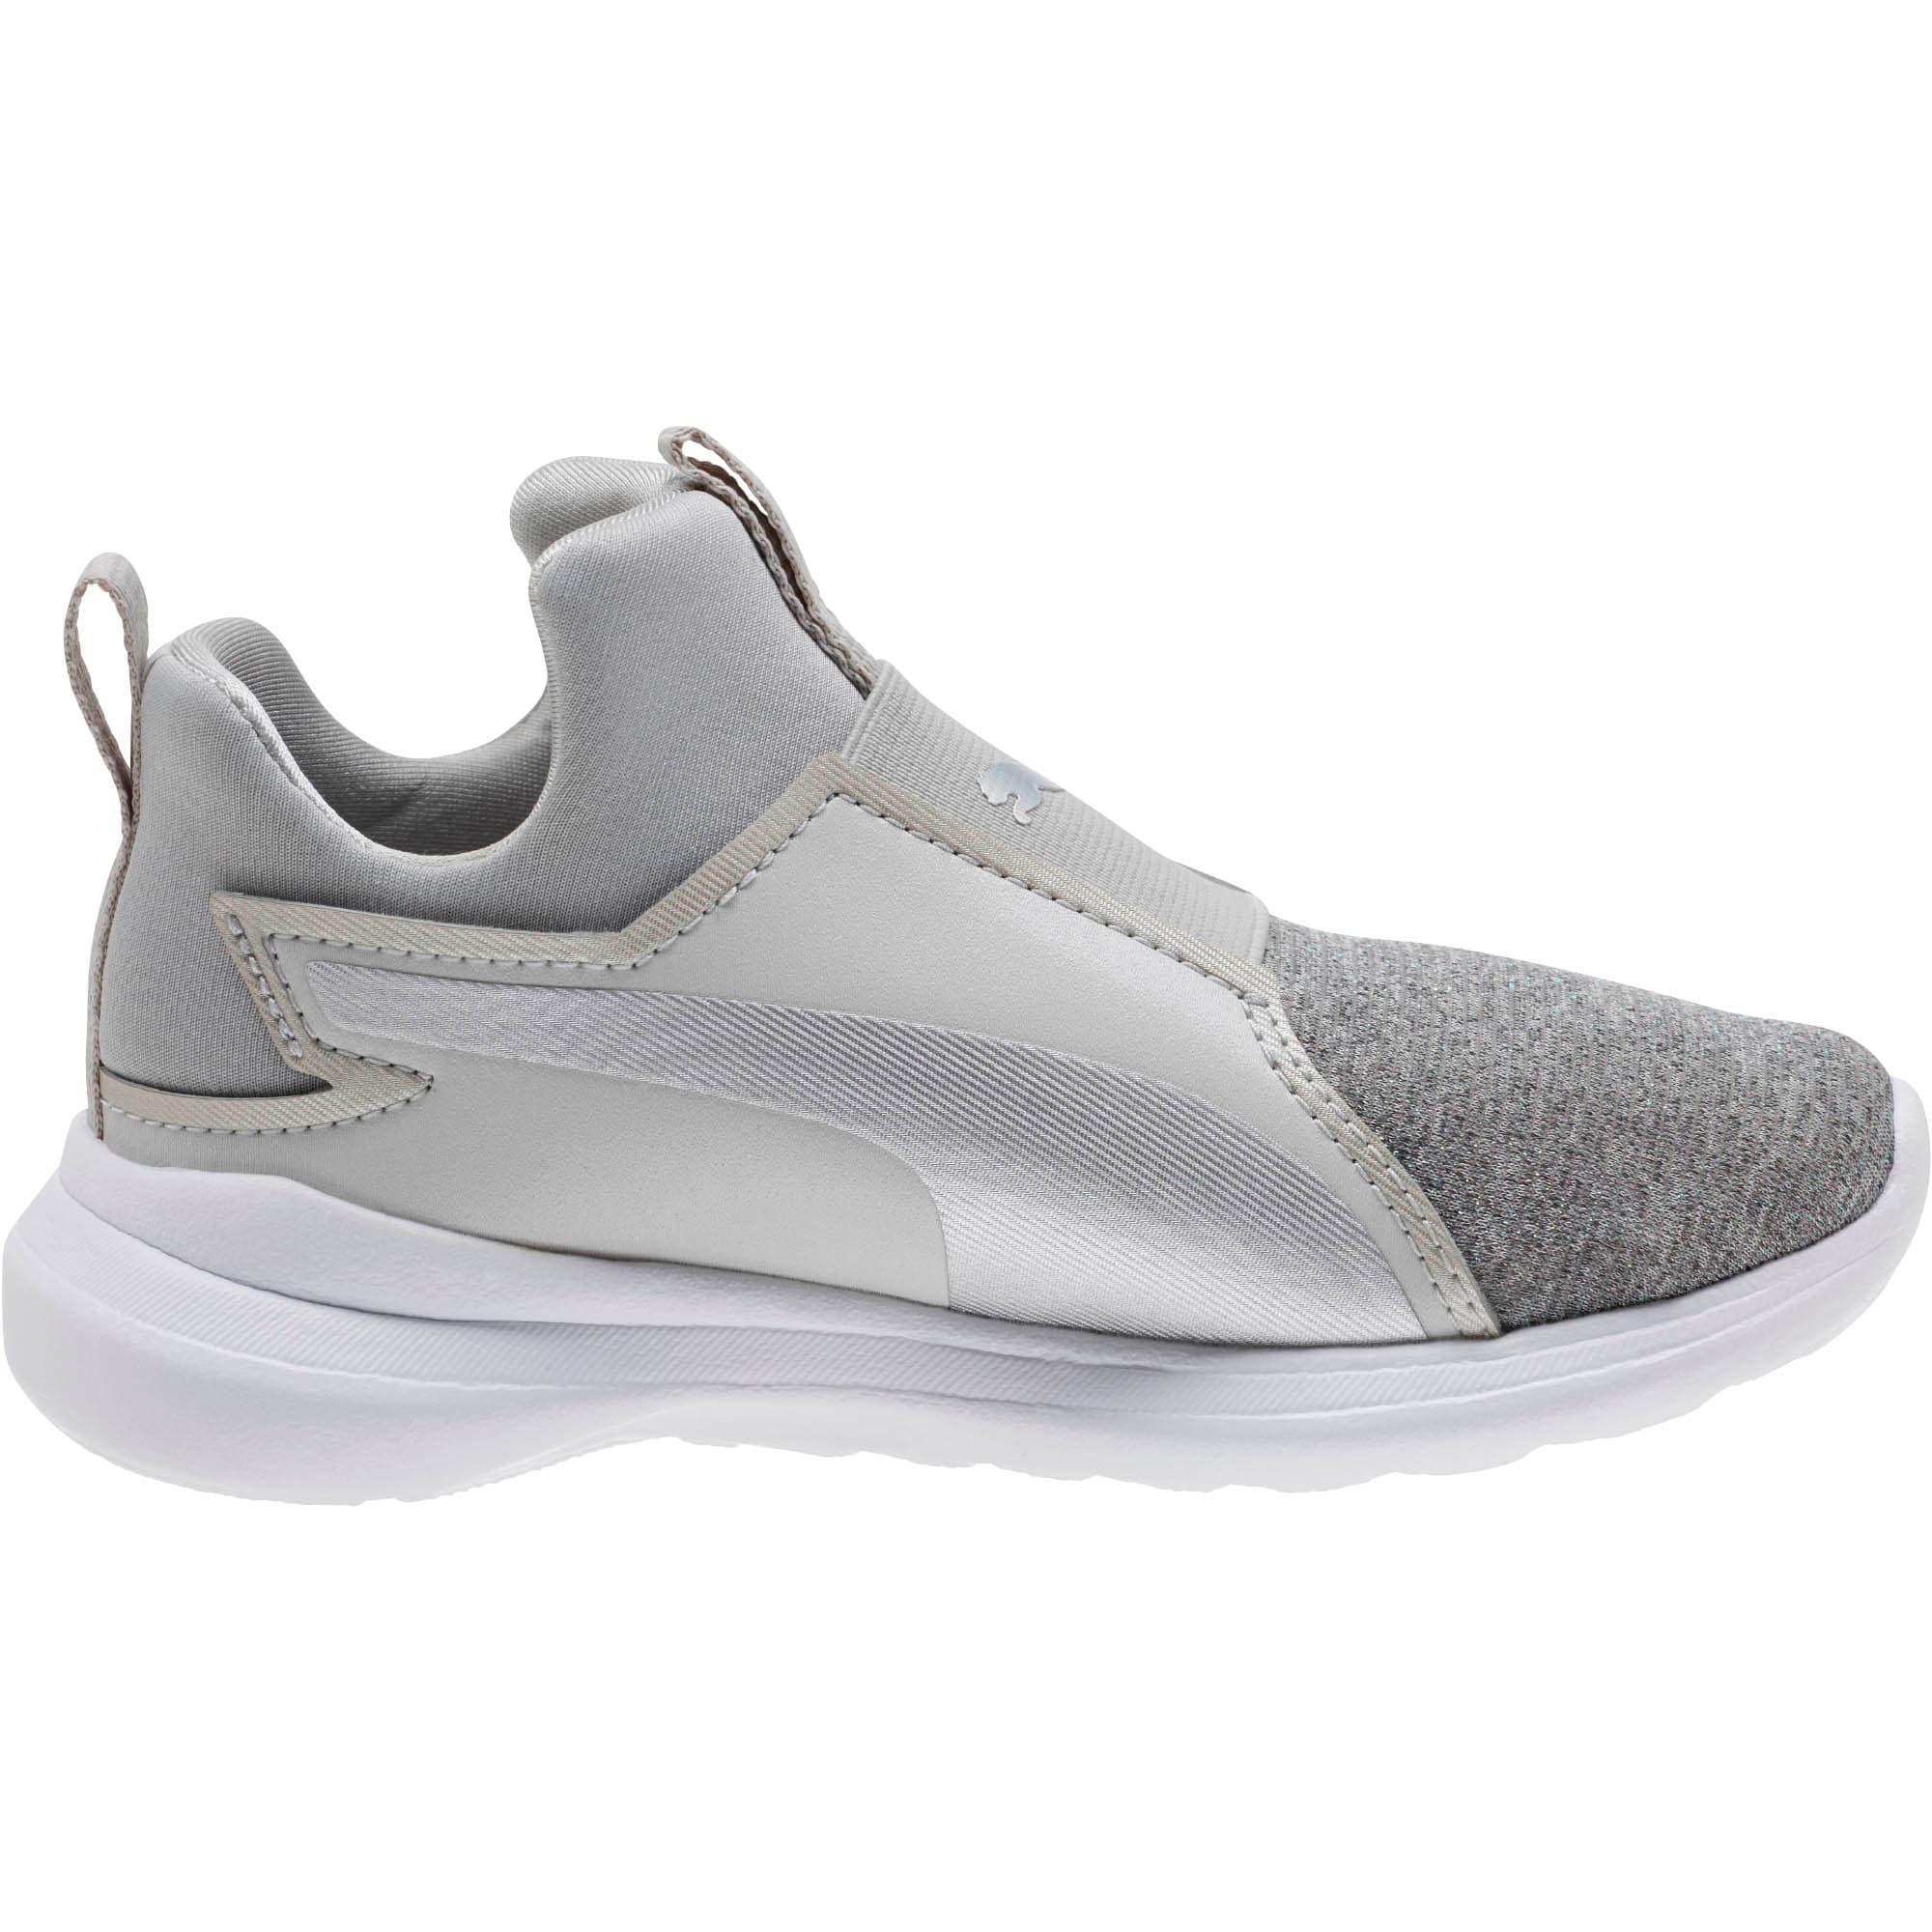 Thumbnail 3 of Puma Rebel Mid Glow Little Kids' Shoes, Gray Violet-Puma Silver, medium